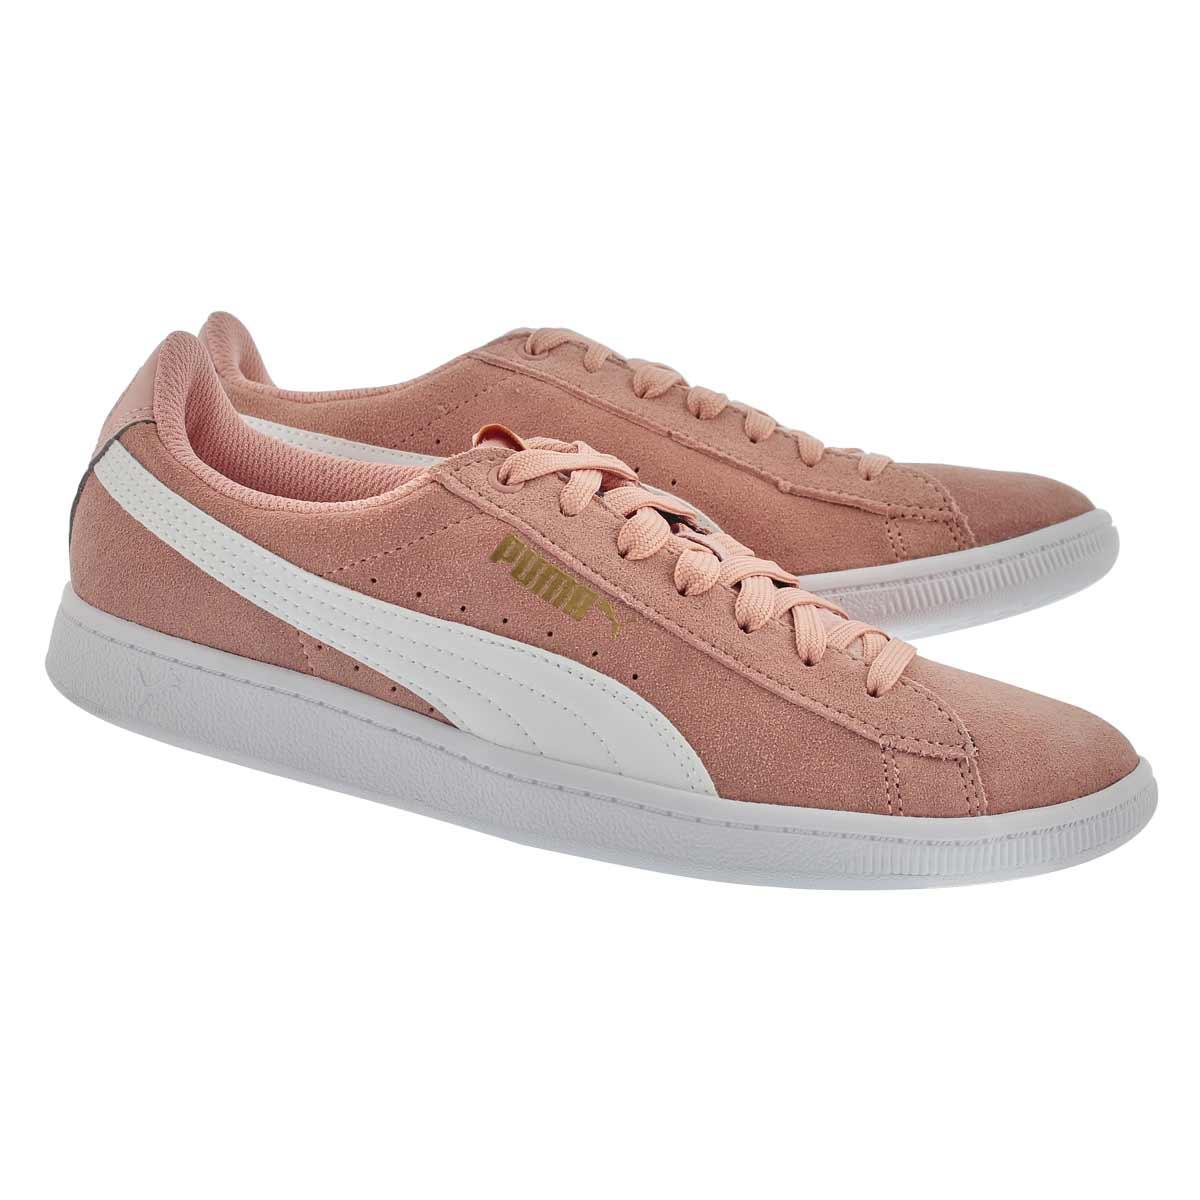 Lds Puma Vikky peach beige sneaker